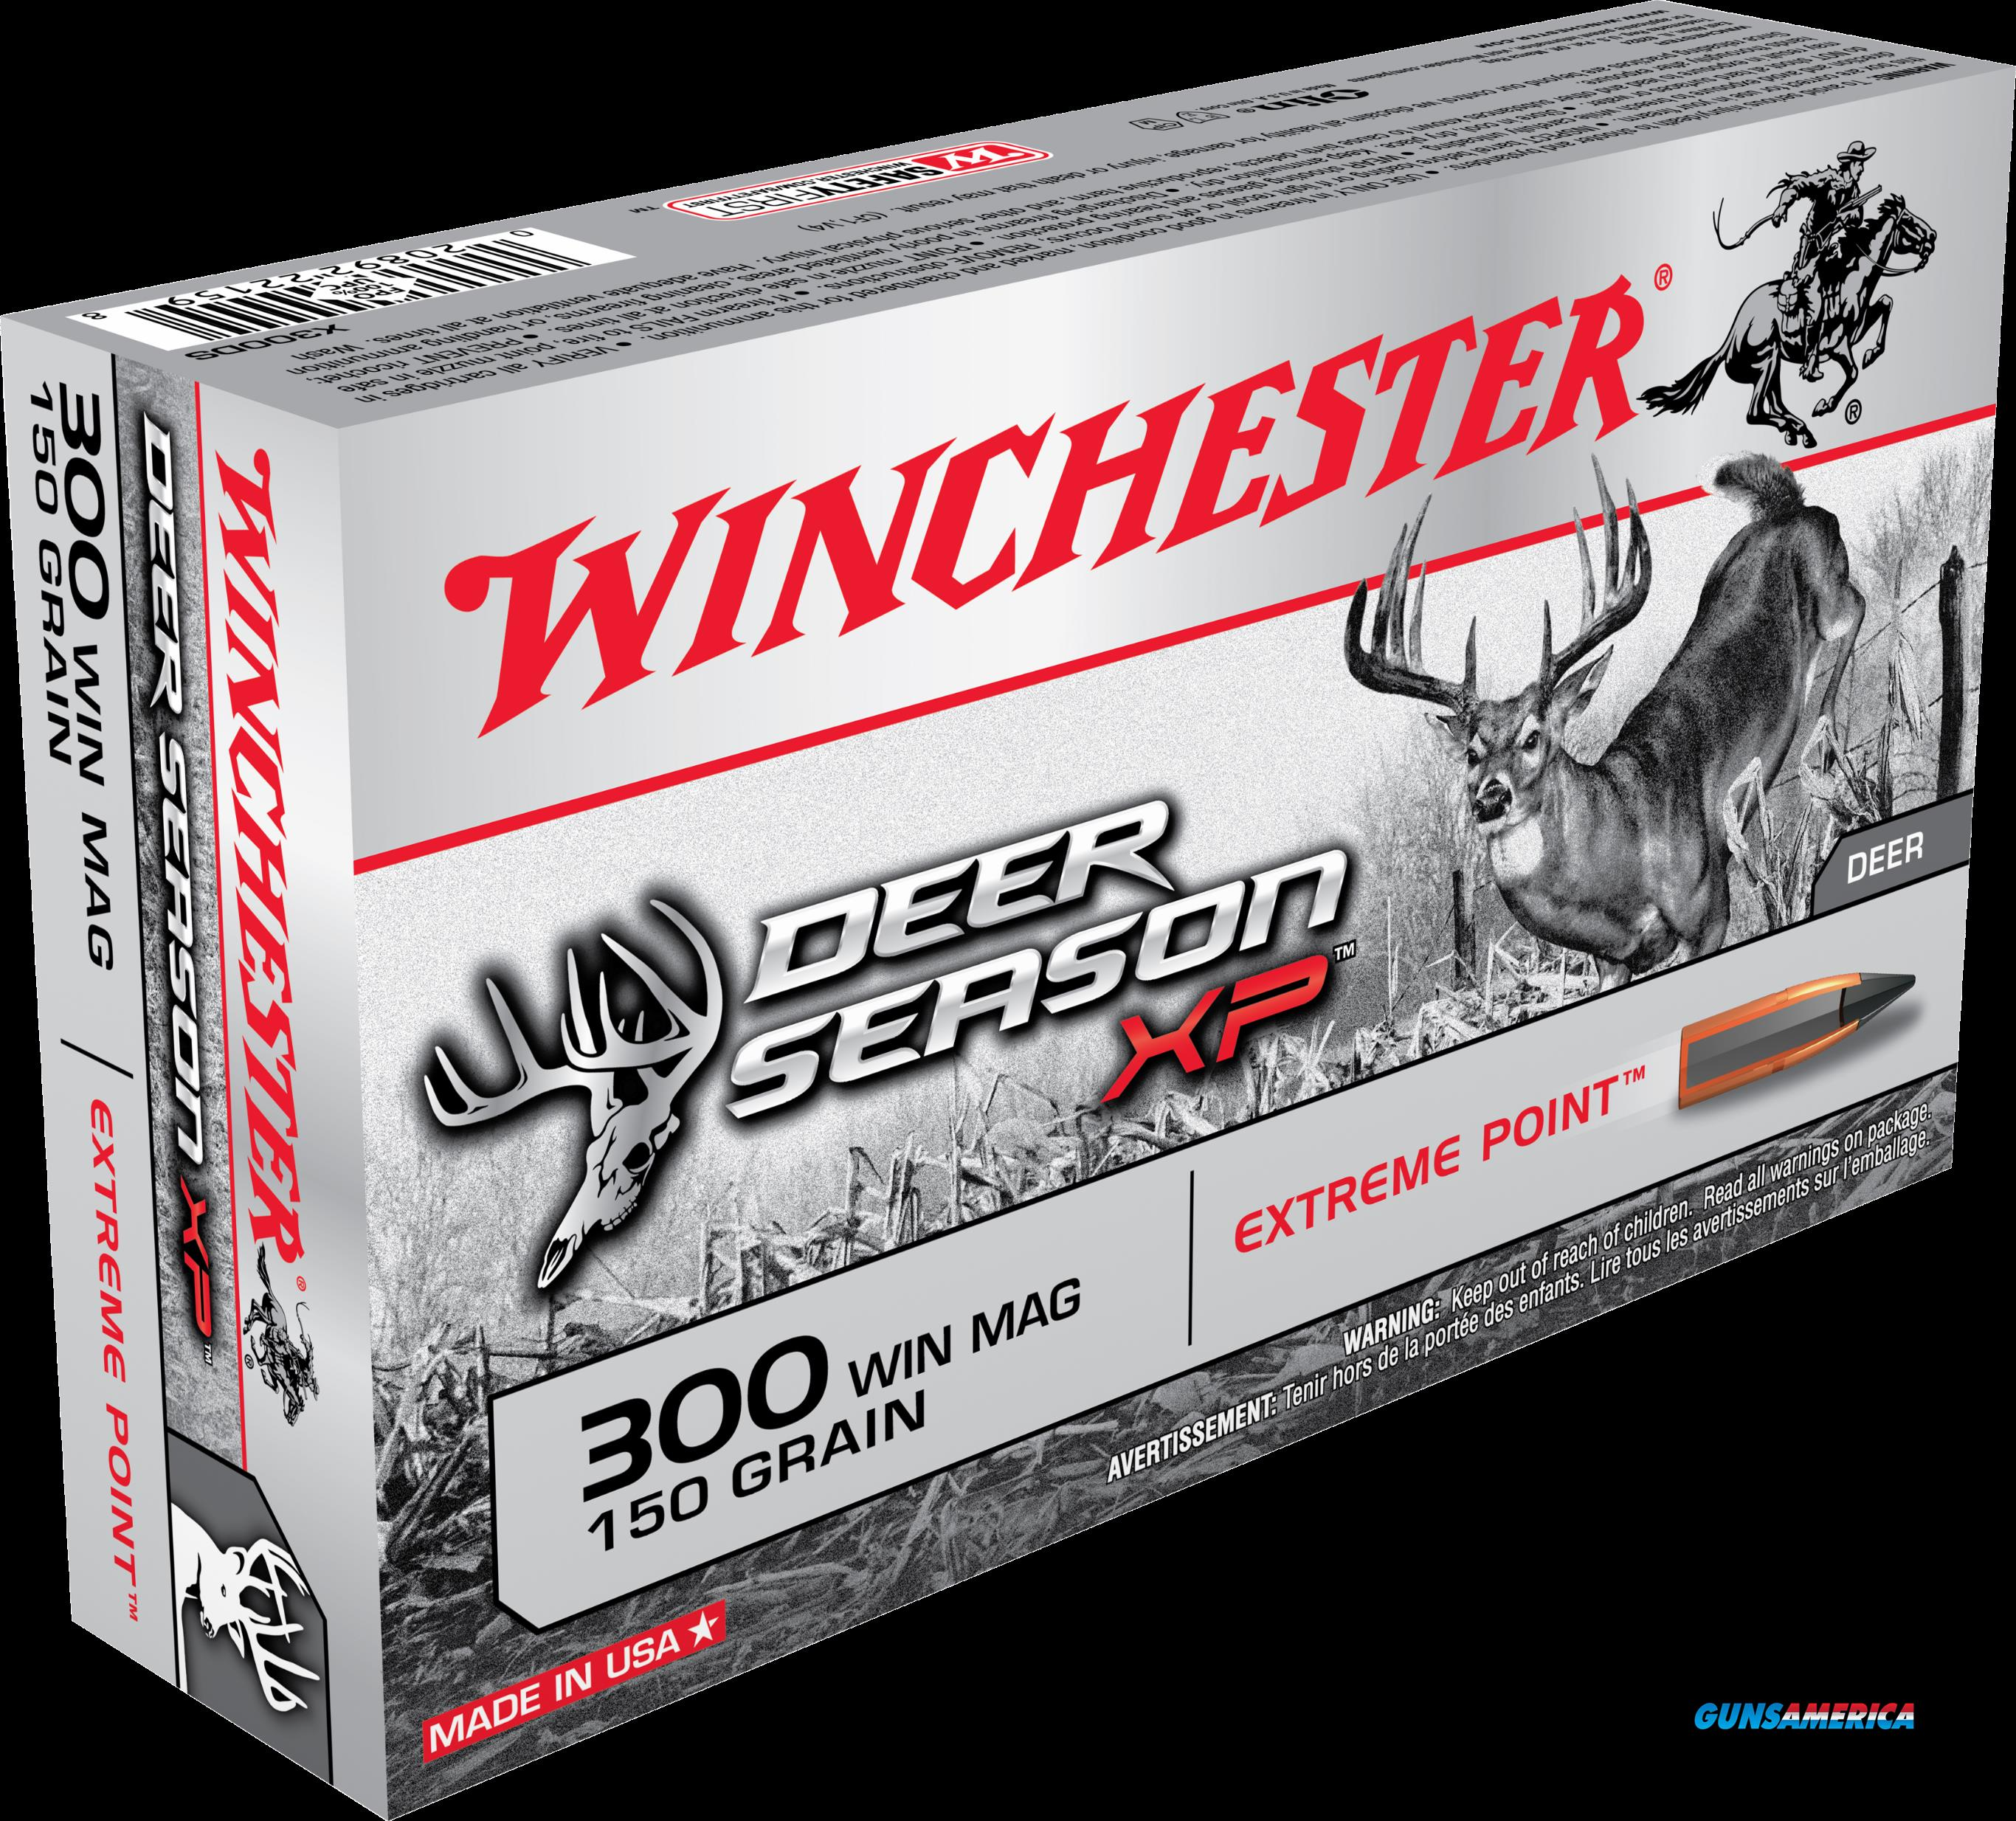 Winchester Ammo Deer Season Xp, Win X300ds  Deer  300win 150ep   20-10  Guns > Pistols > 1911 Pistol Copies (non-Colt)